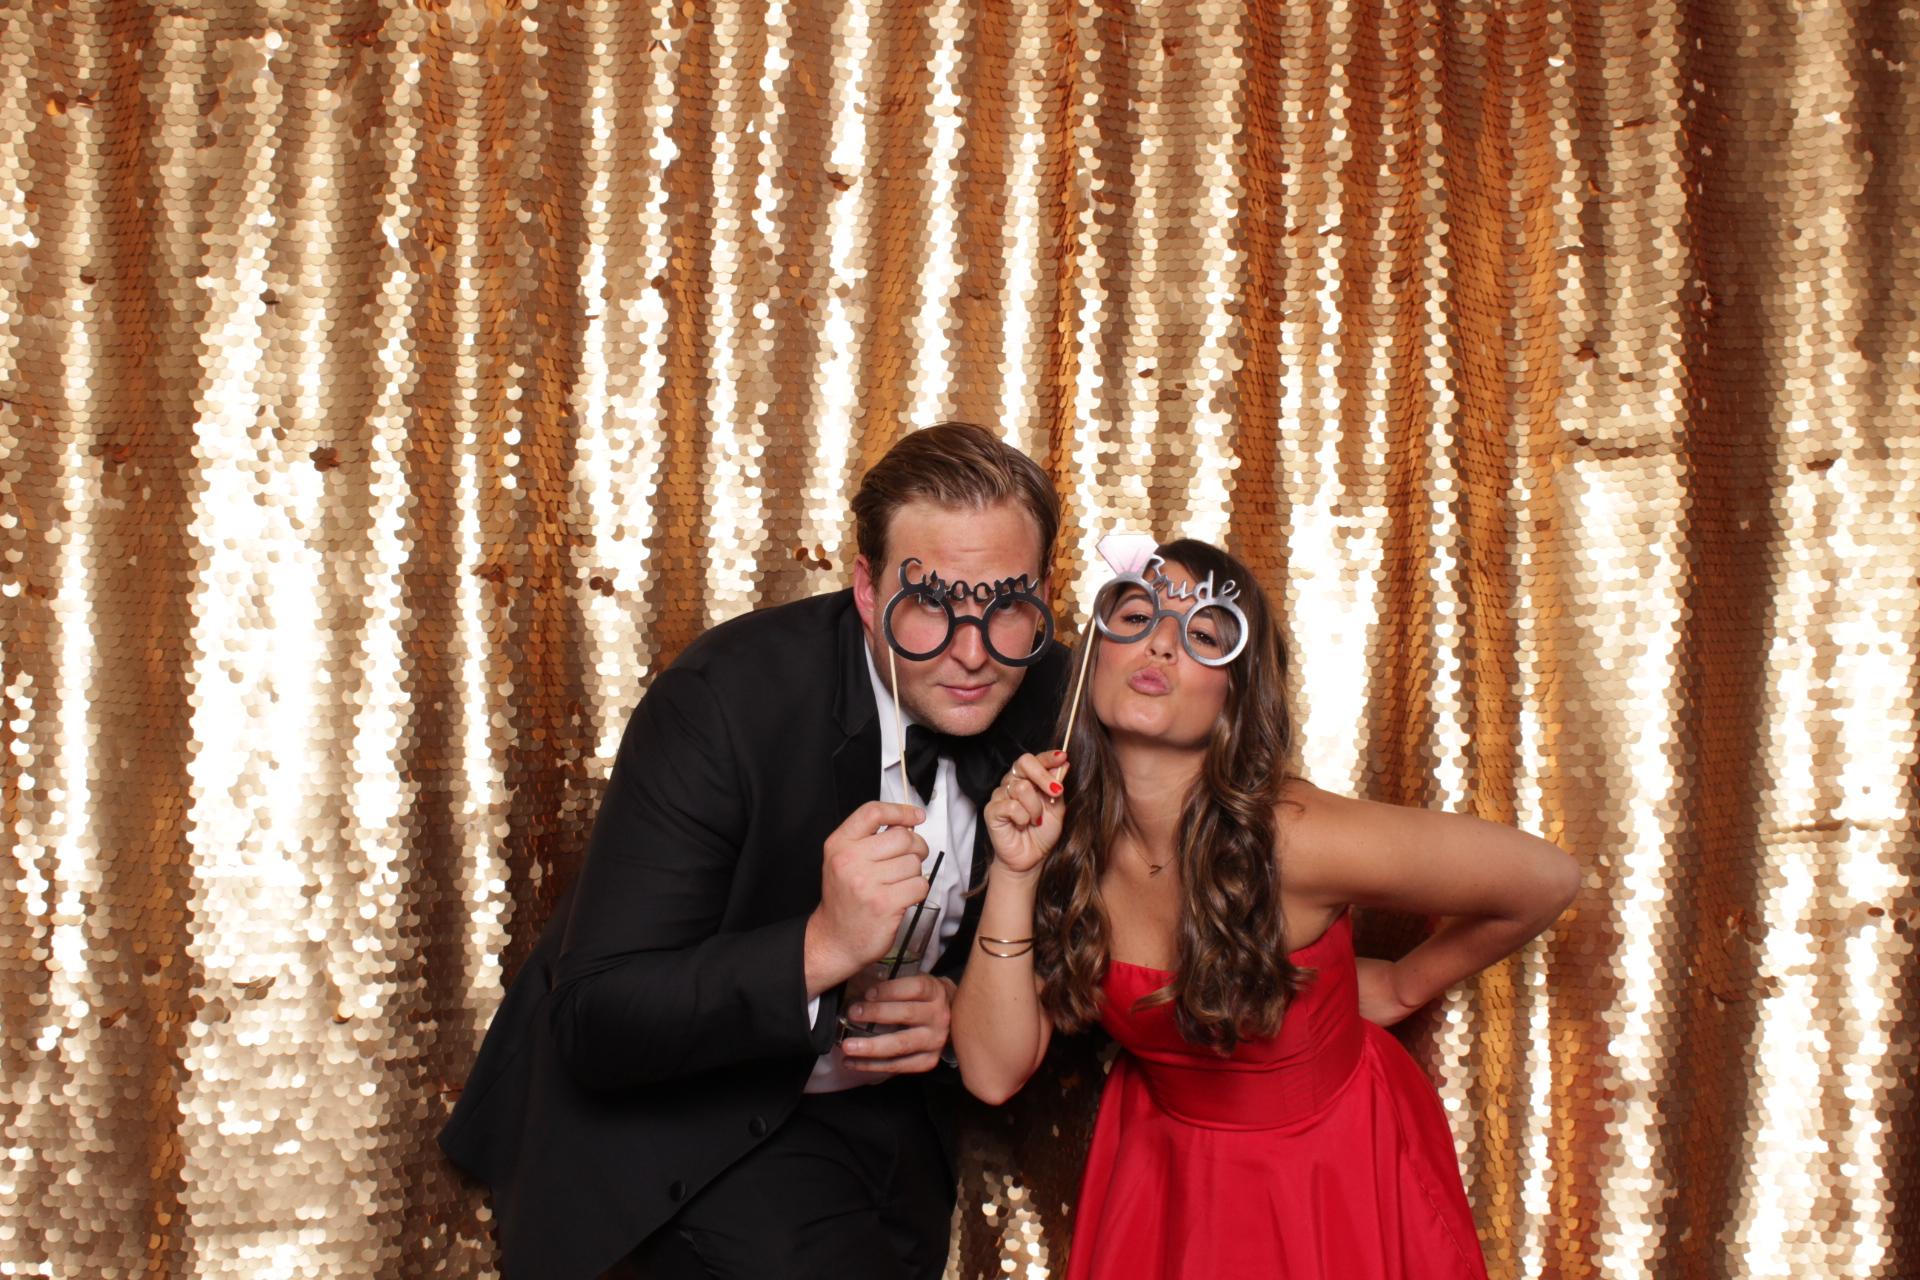 Minneapolis_wedding_photo_booth_Machine_Shop (16).jpg